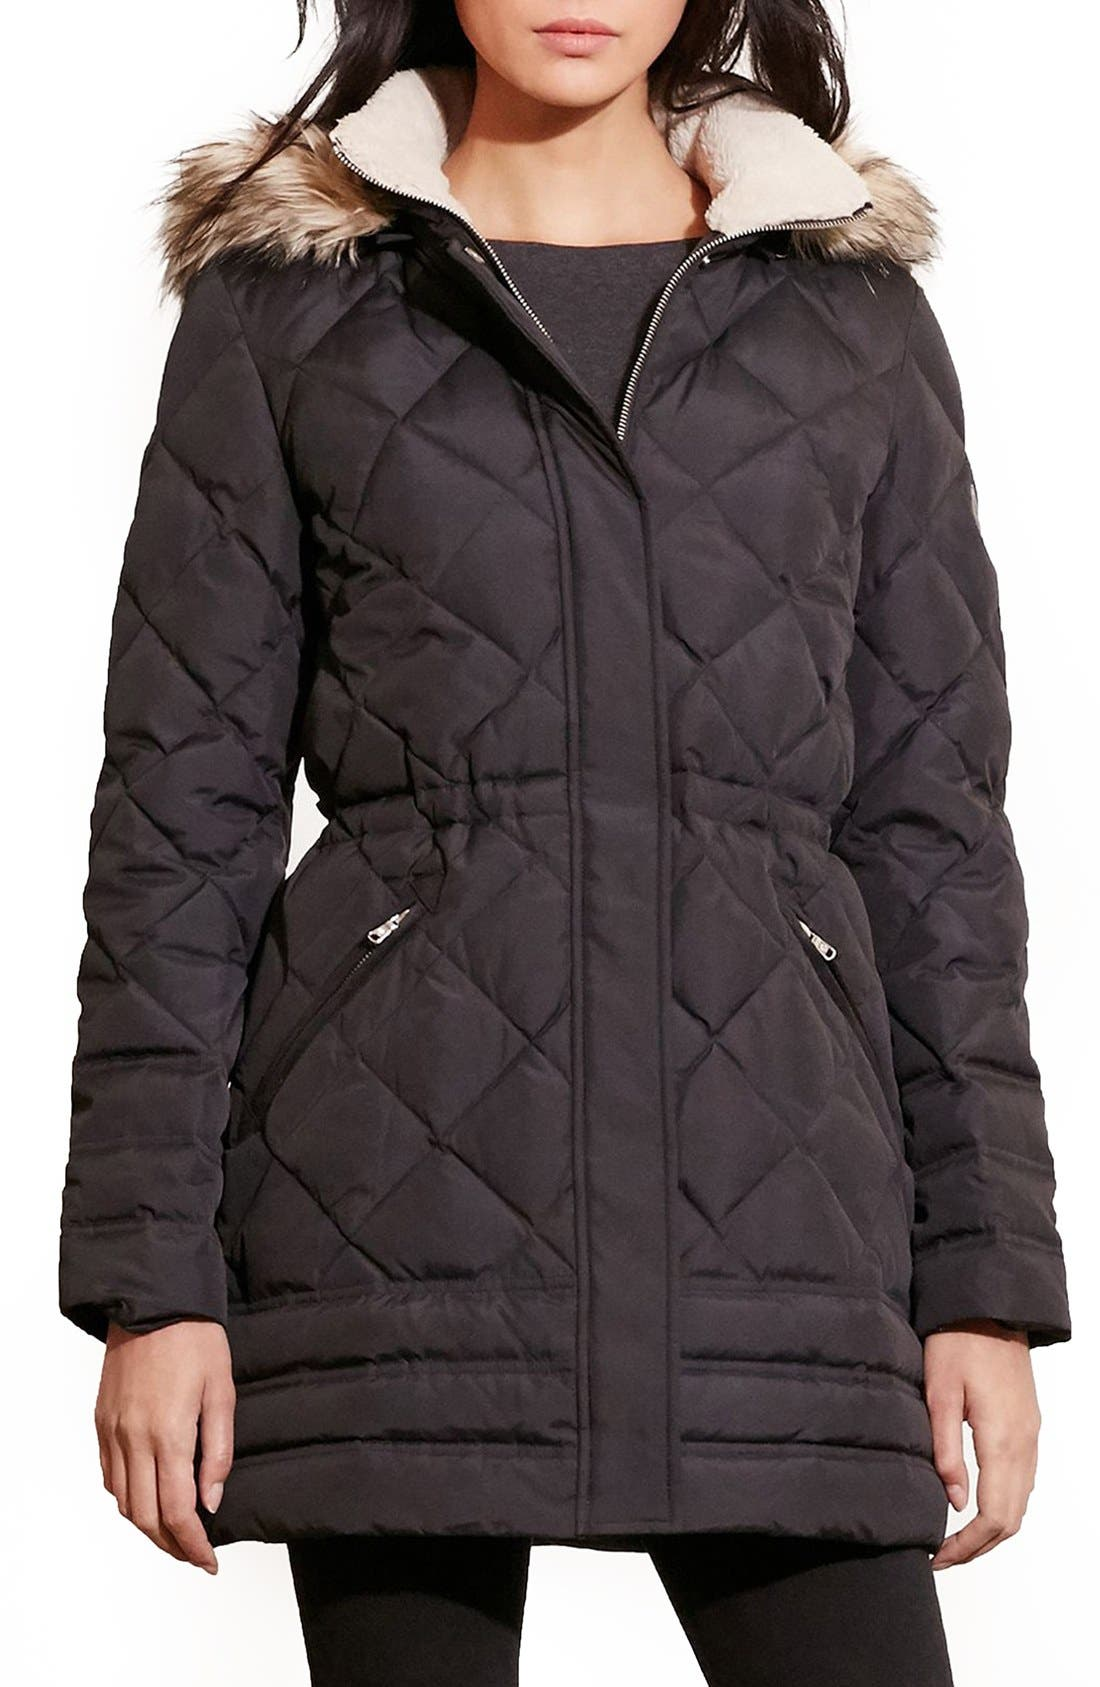 Alternate Image 1 Selected - Lauren Ralph Lauren Quilted Jacket with Faux Fur Trim